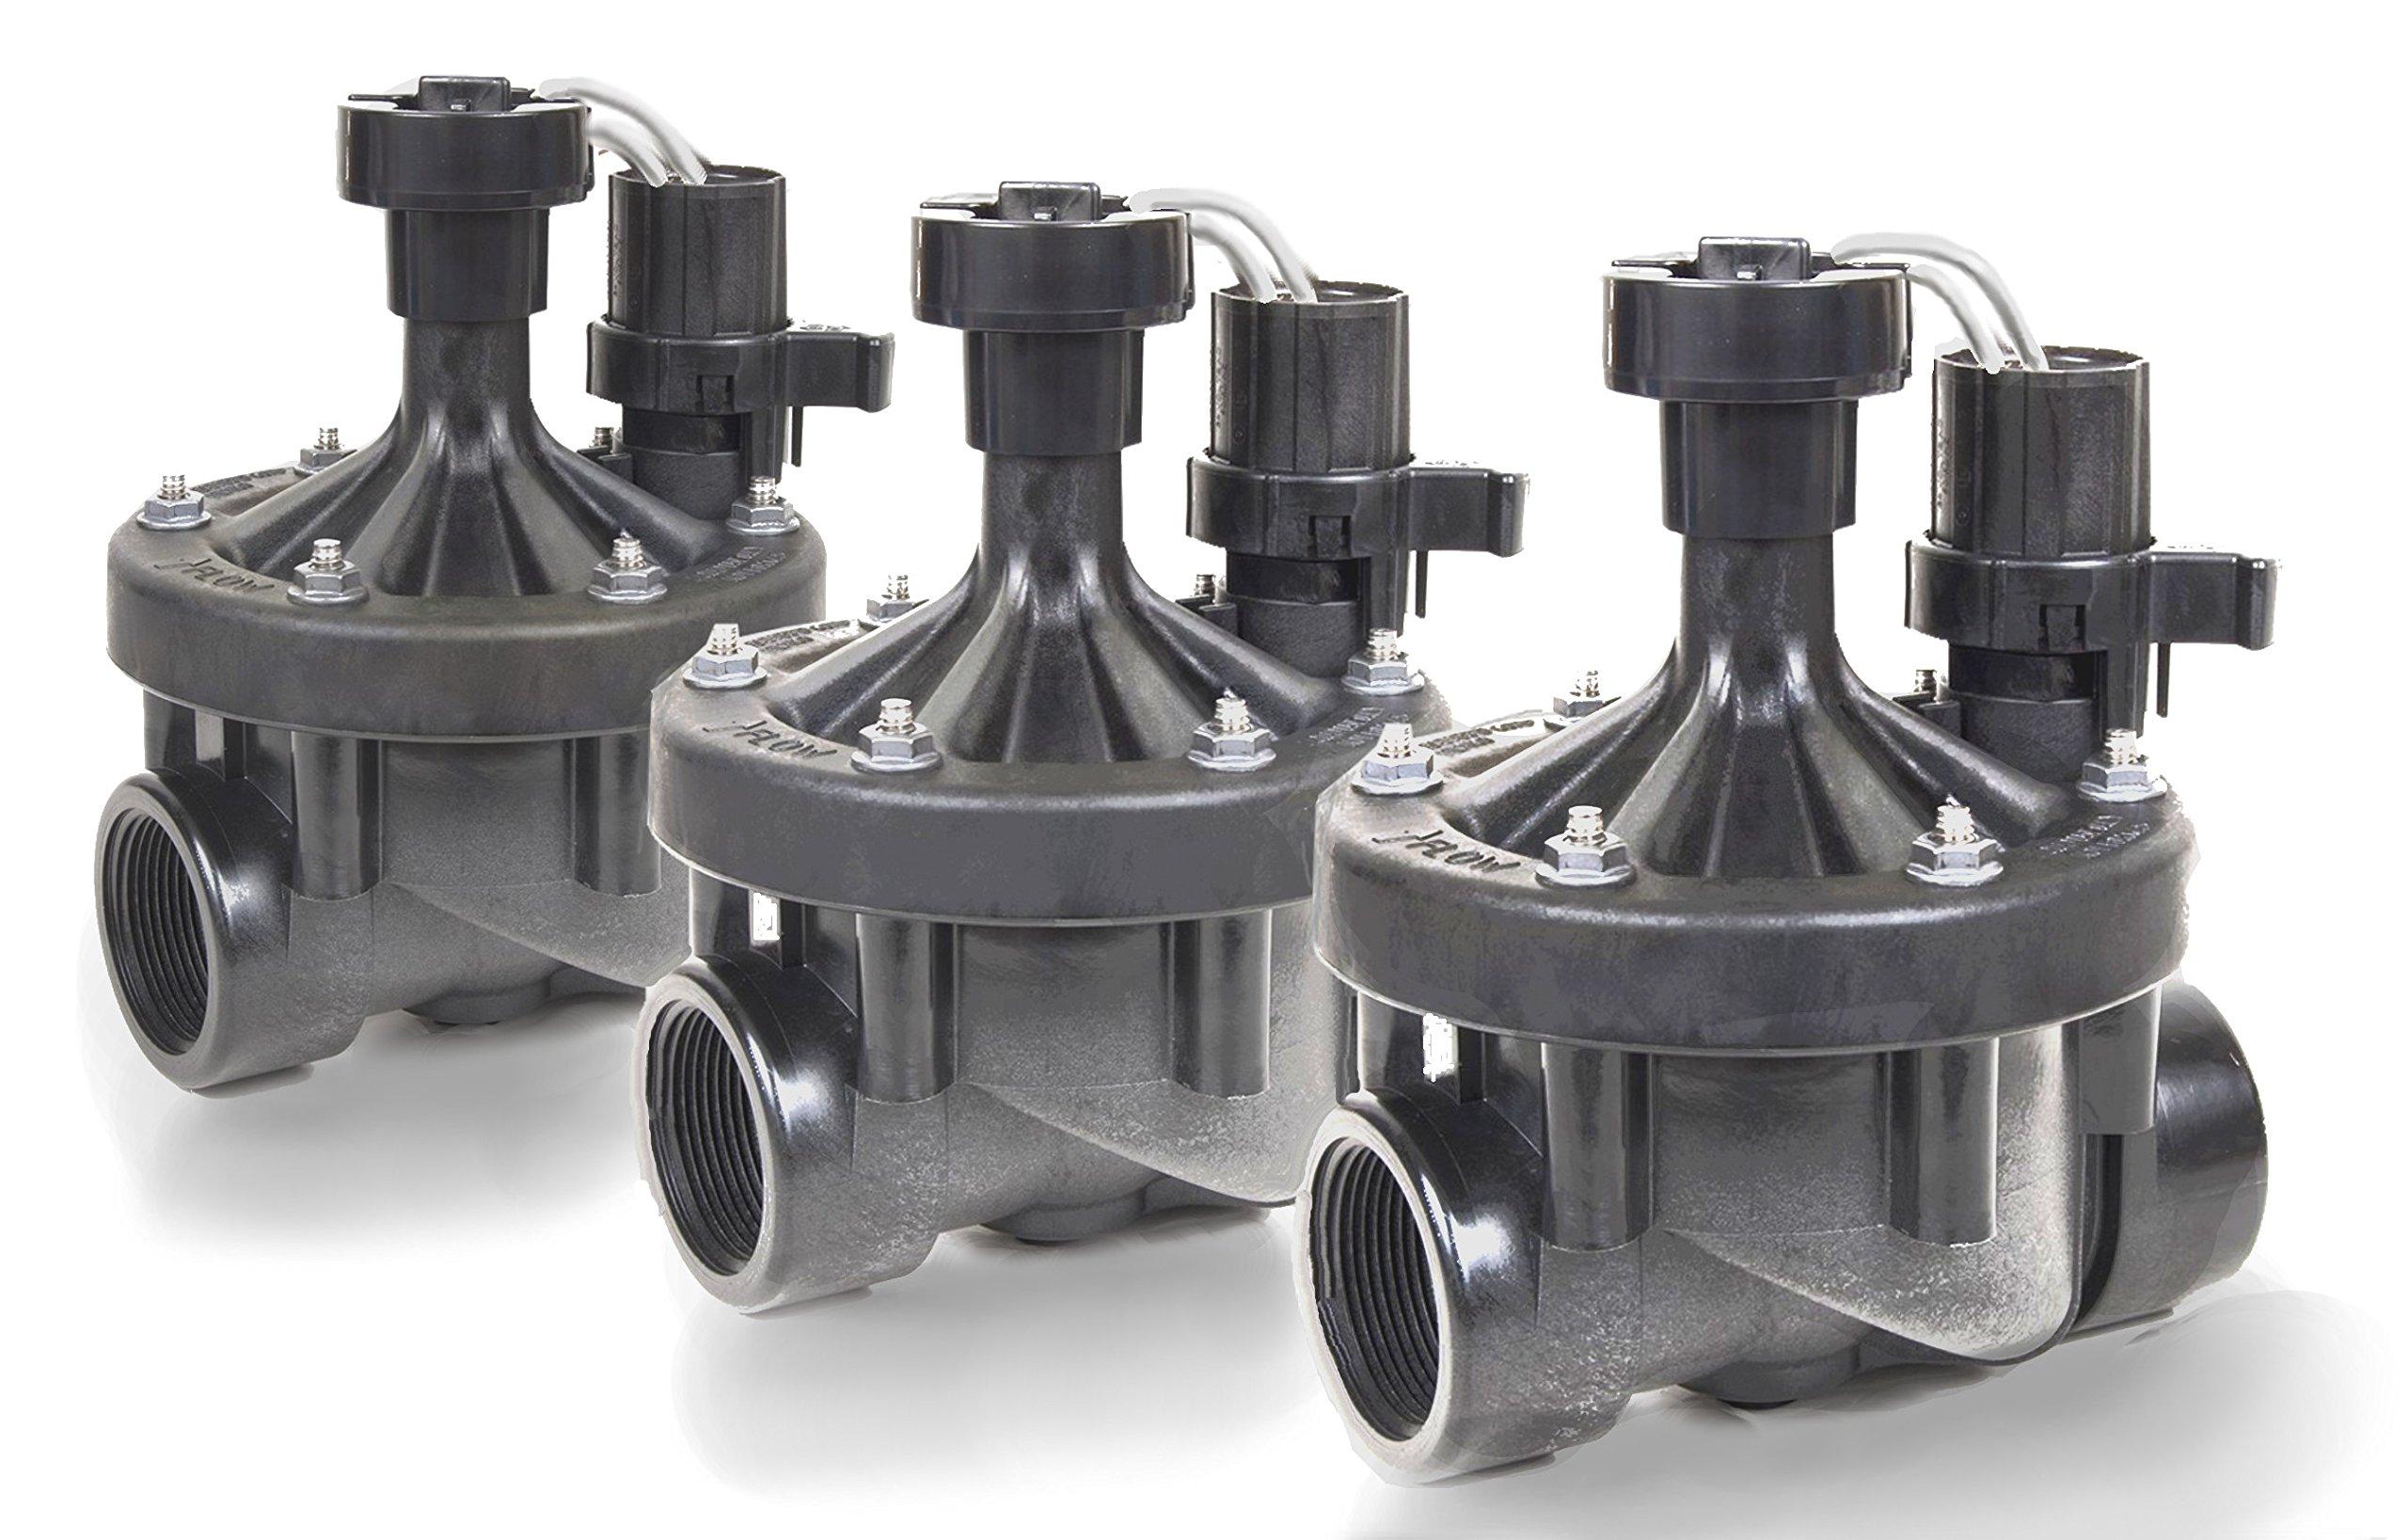 3 Rainbird 150-PEB 1-1/2'' Threaded Sprinkler & Irrigation Valves 1.5'' (5) by Rain Bird